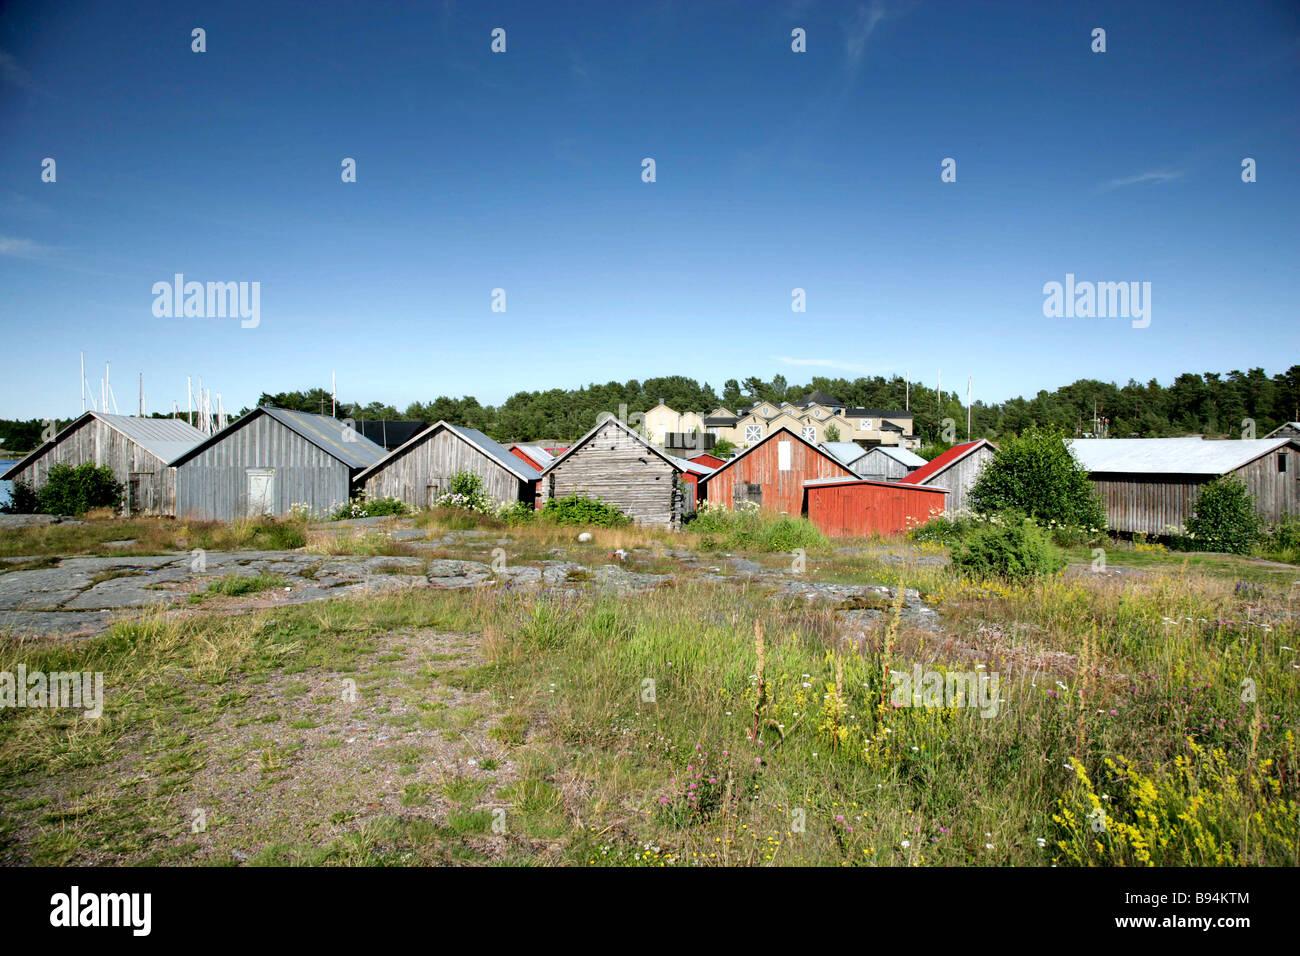 Boatsheds in Aland Stock Photo